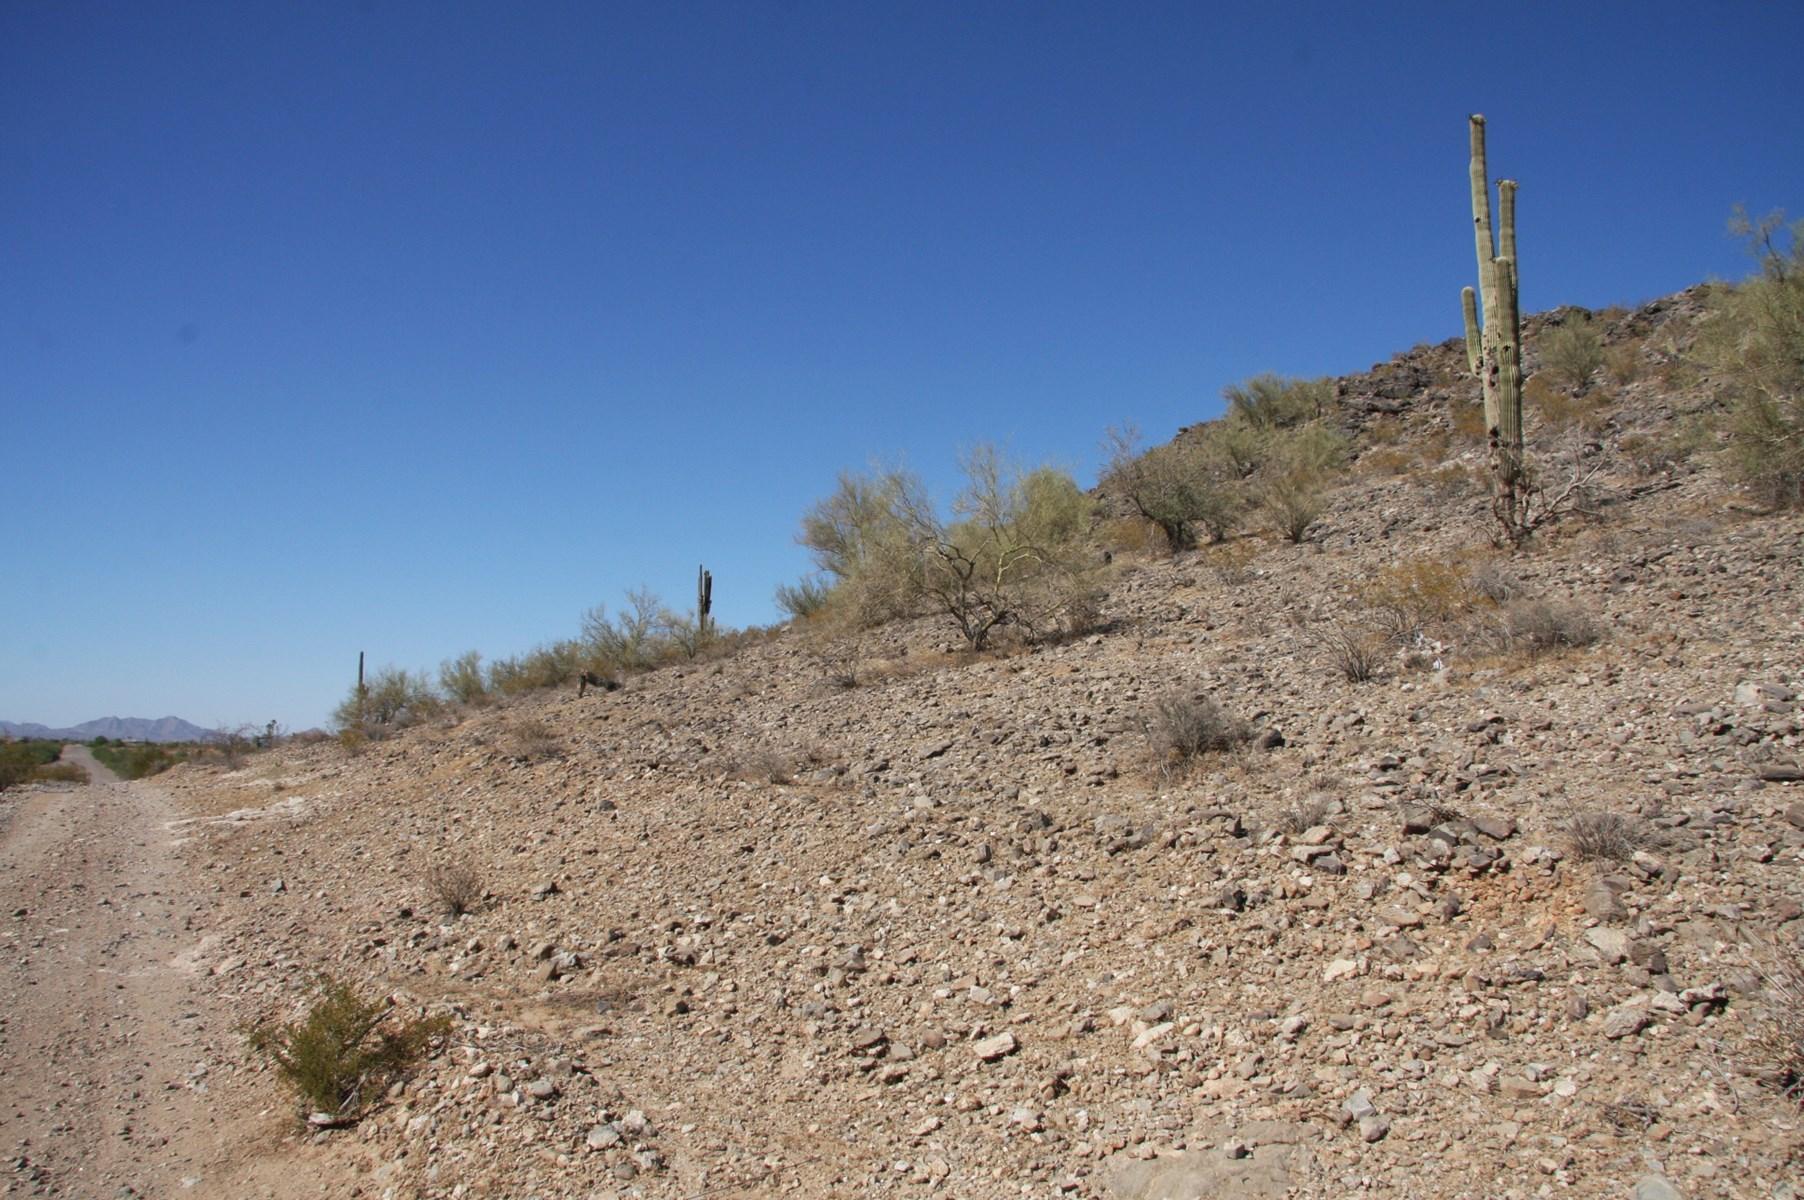 Land for sale in Casa Grande, AZ